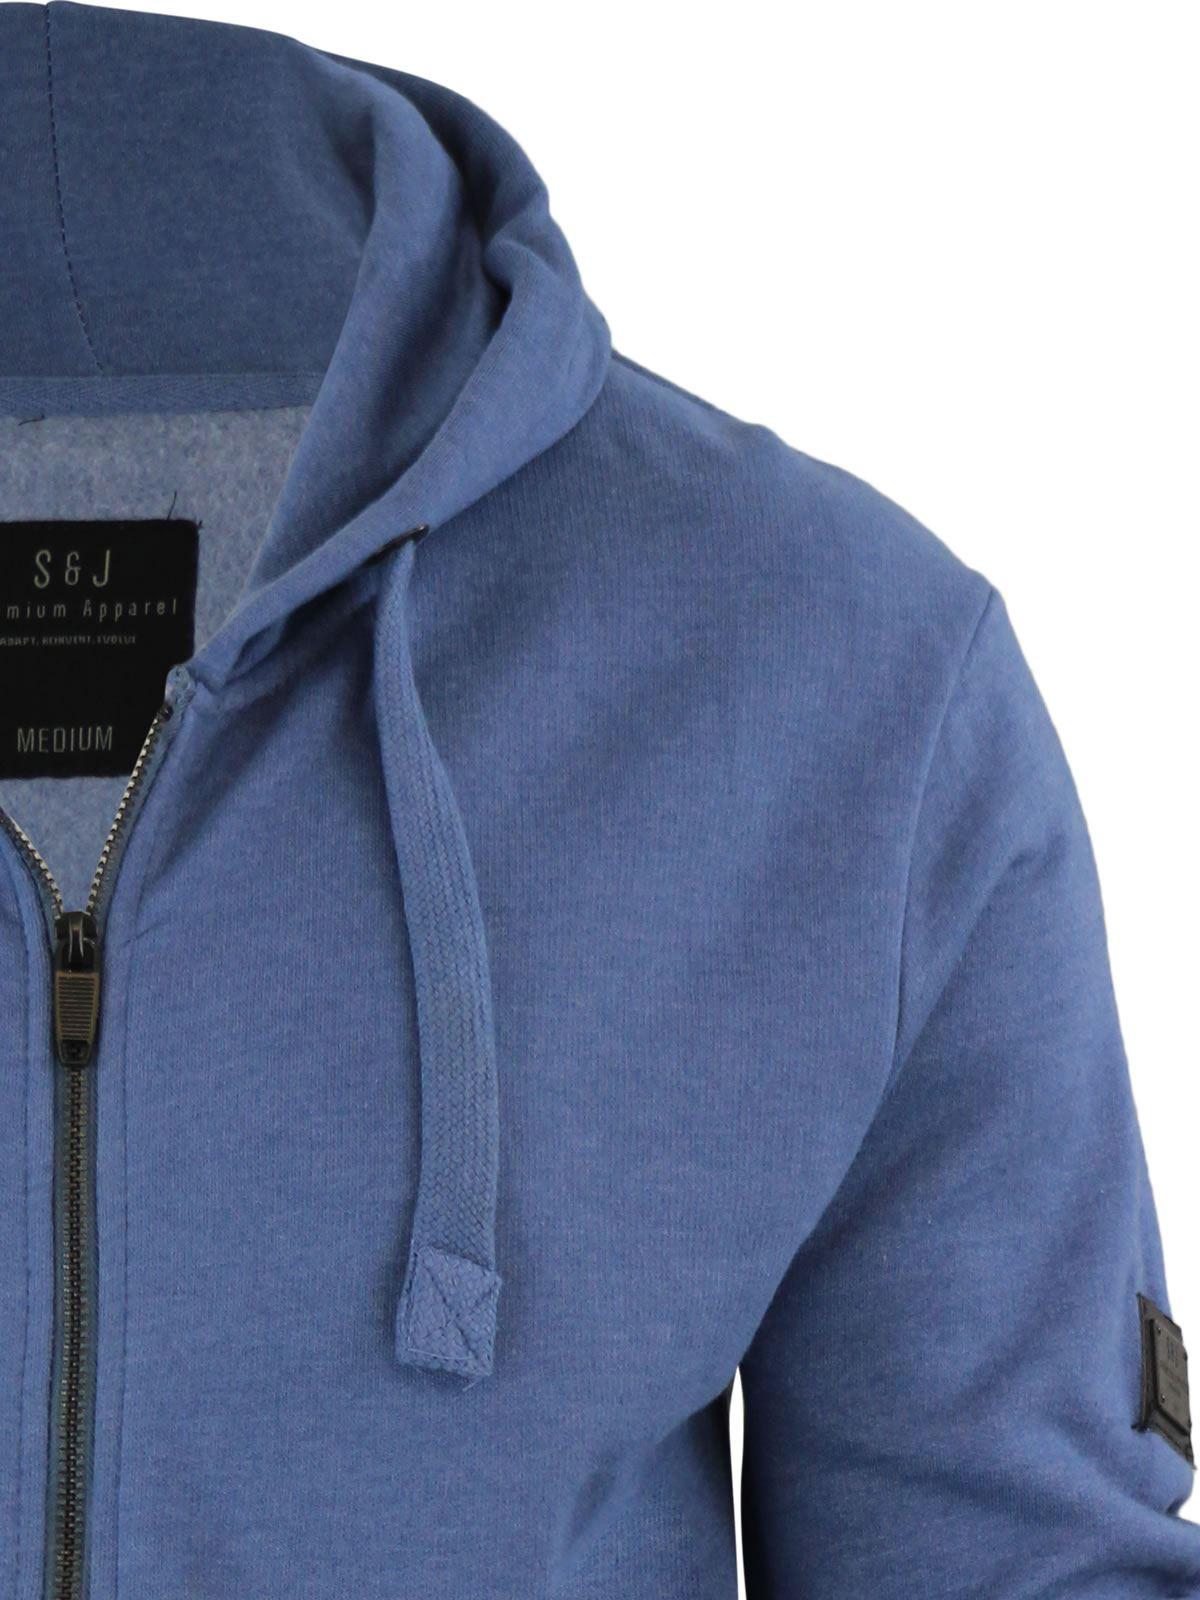 Mens-Hoodie-Smith-amp-Jones-Zip-Up-Hooded-Sweater-Jumper thumbnail 31